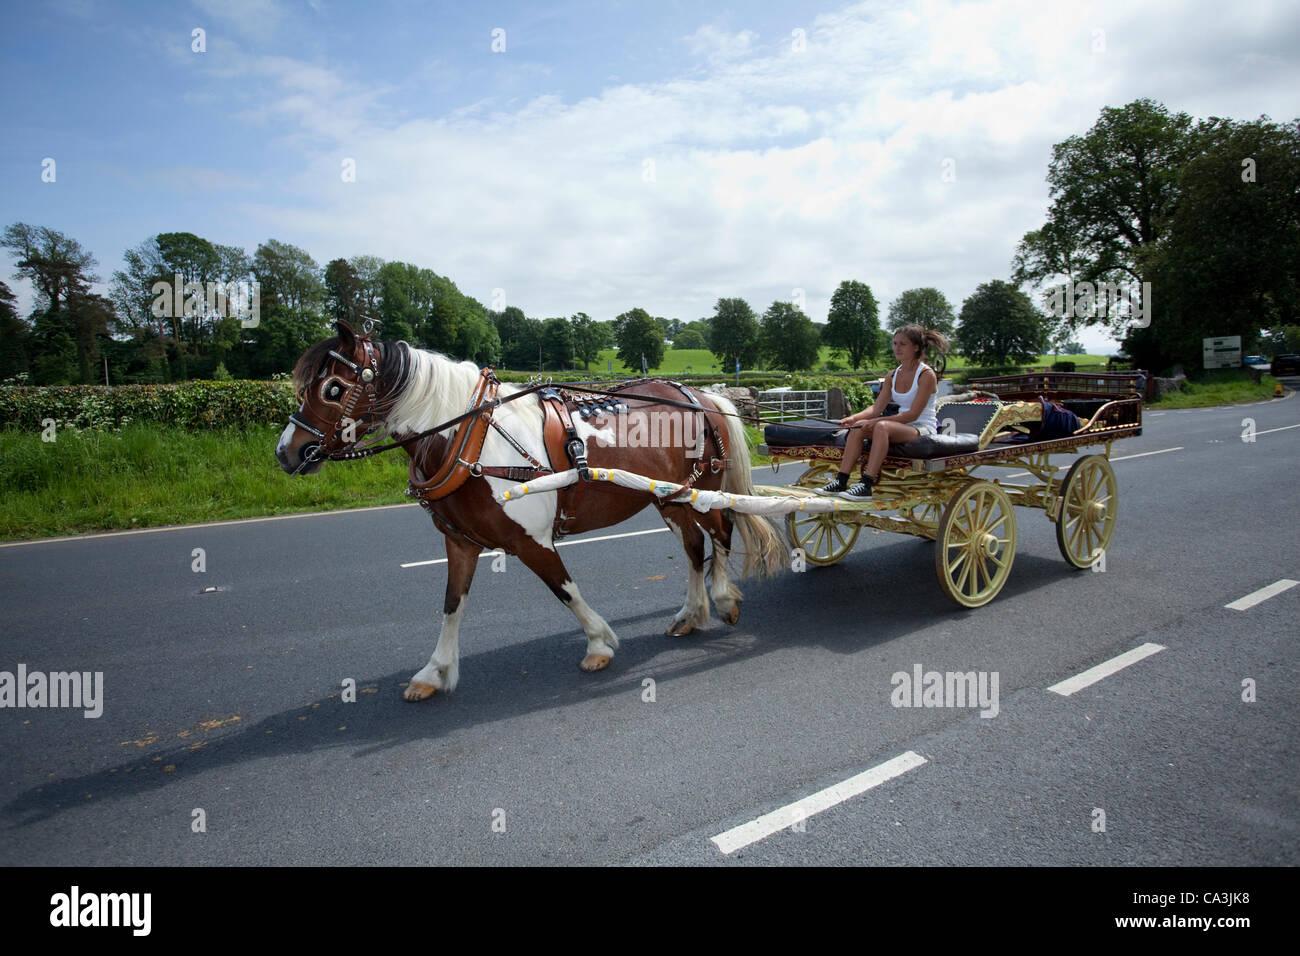 Creative Family In Horsedrawn Caravan Wagon In Rural Ireland View Large Photo